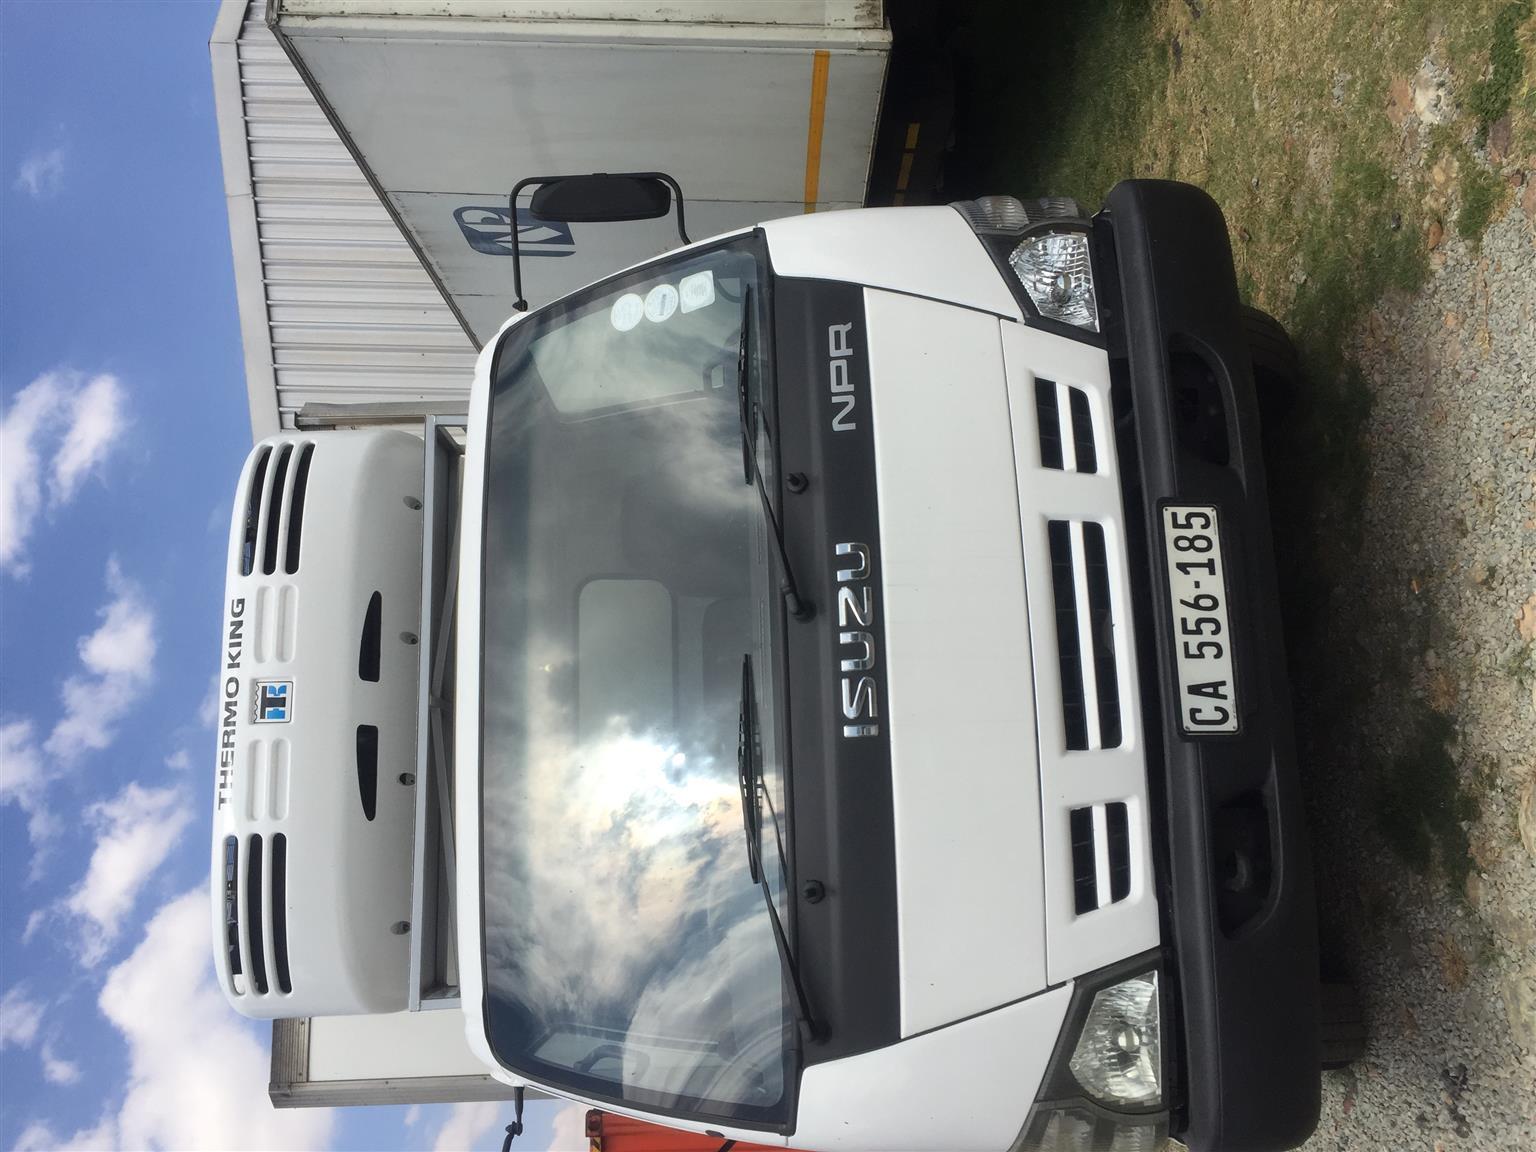 Isuzu NPR400 4ton fridge unit truck on special